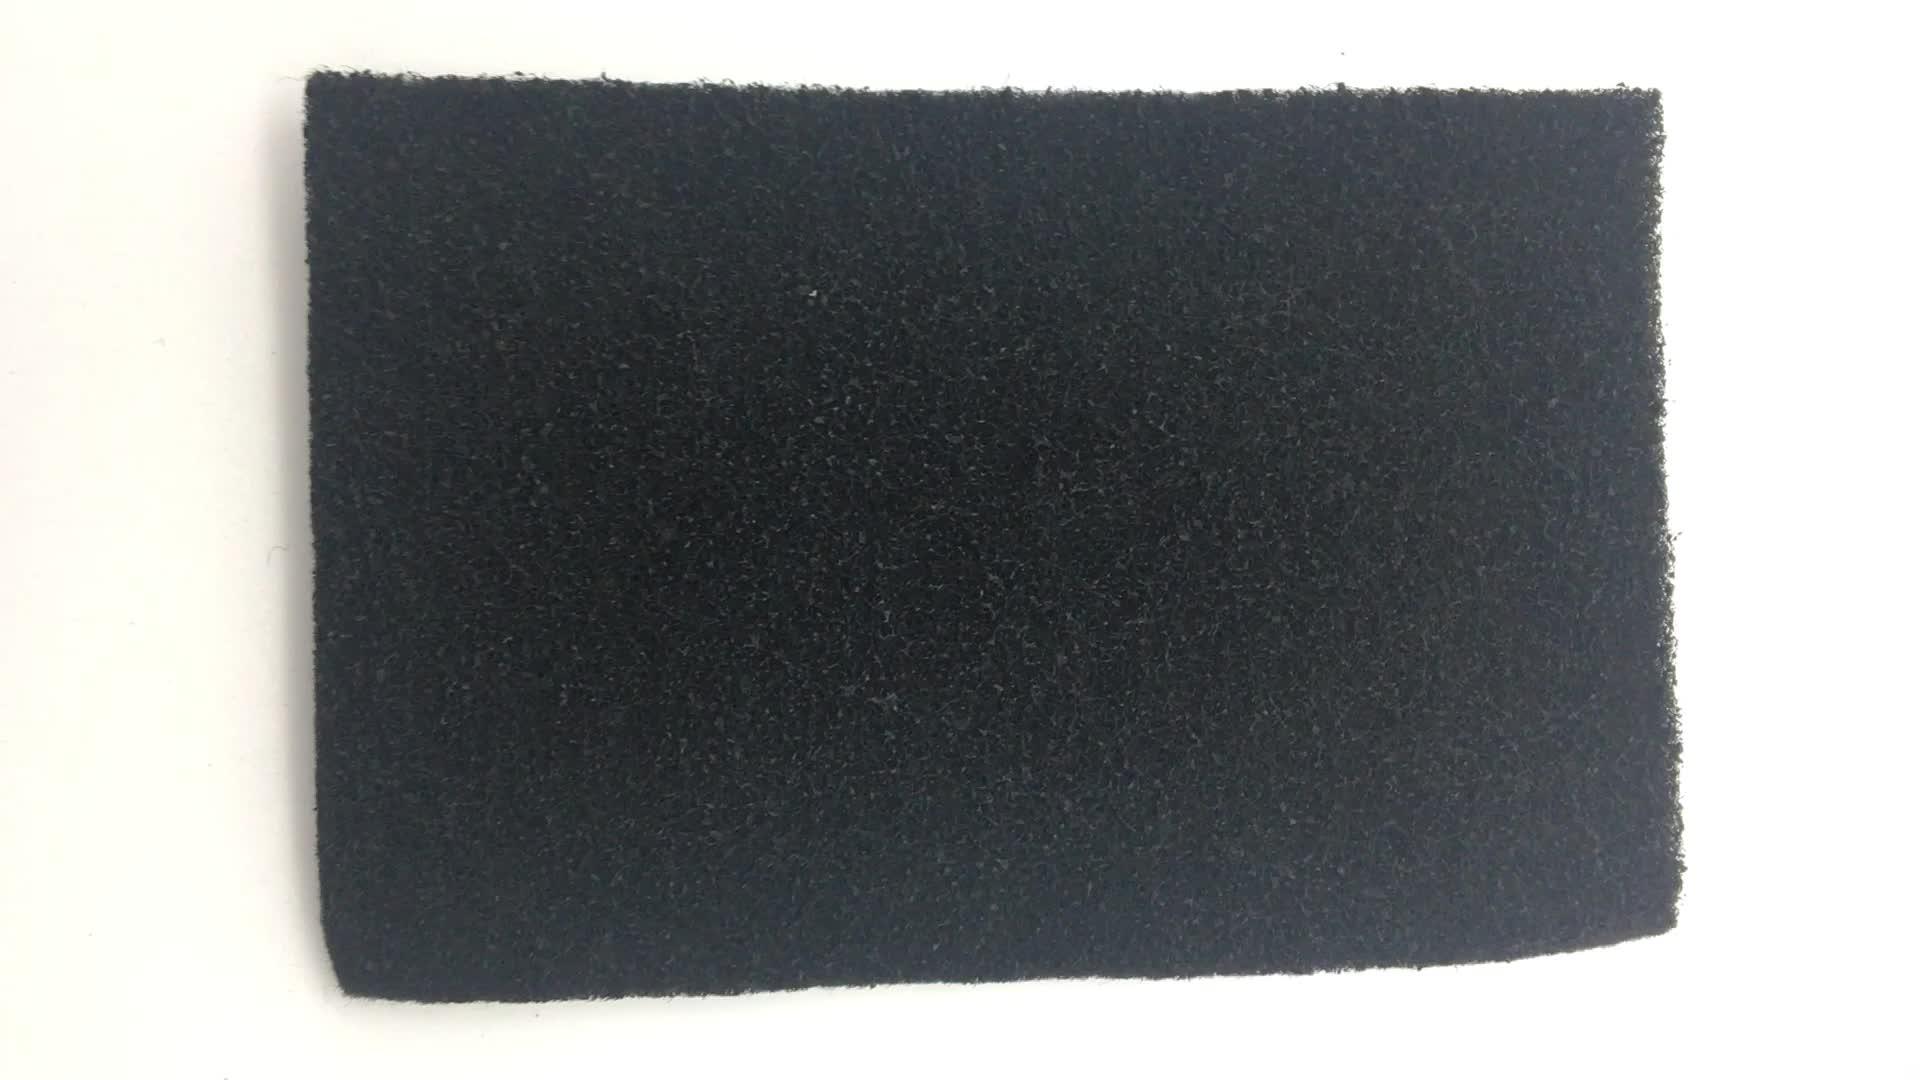 carbon air filter sheet for air filtration